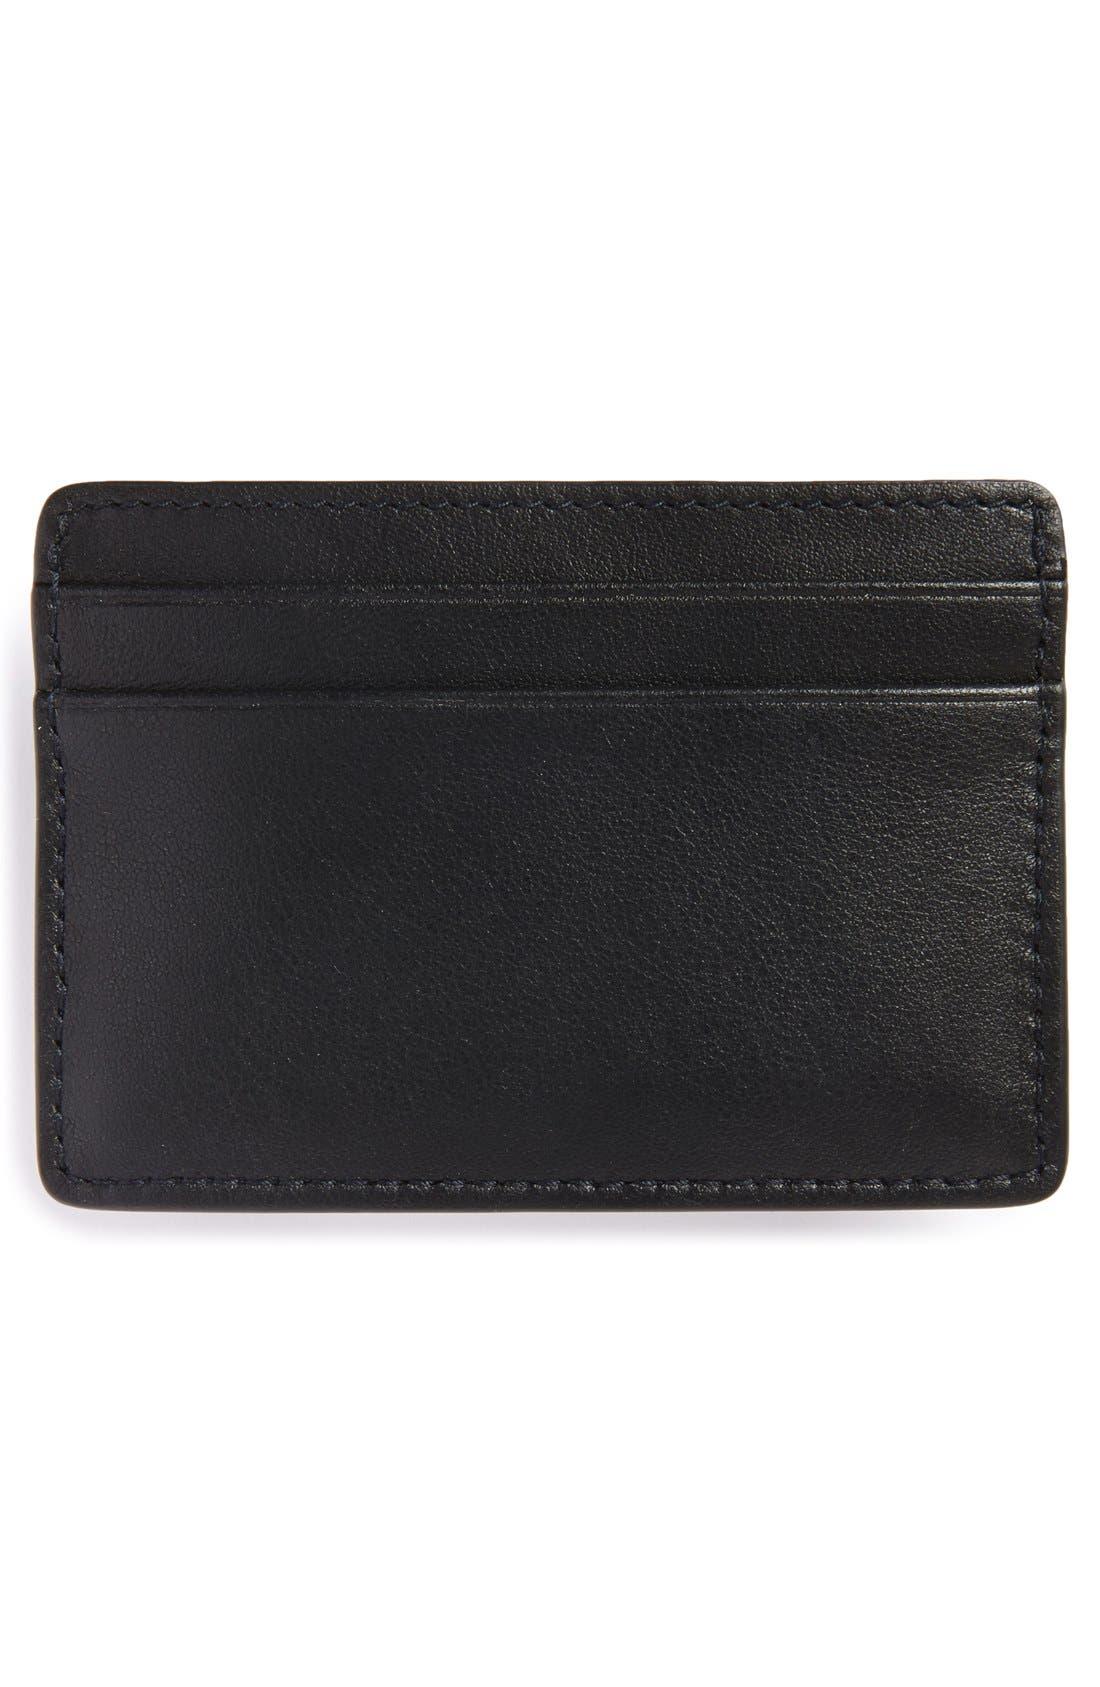 Traveler Card Case,                             Alternate thumbnail 2, color,                             Black